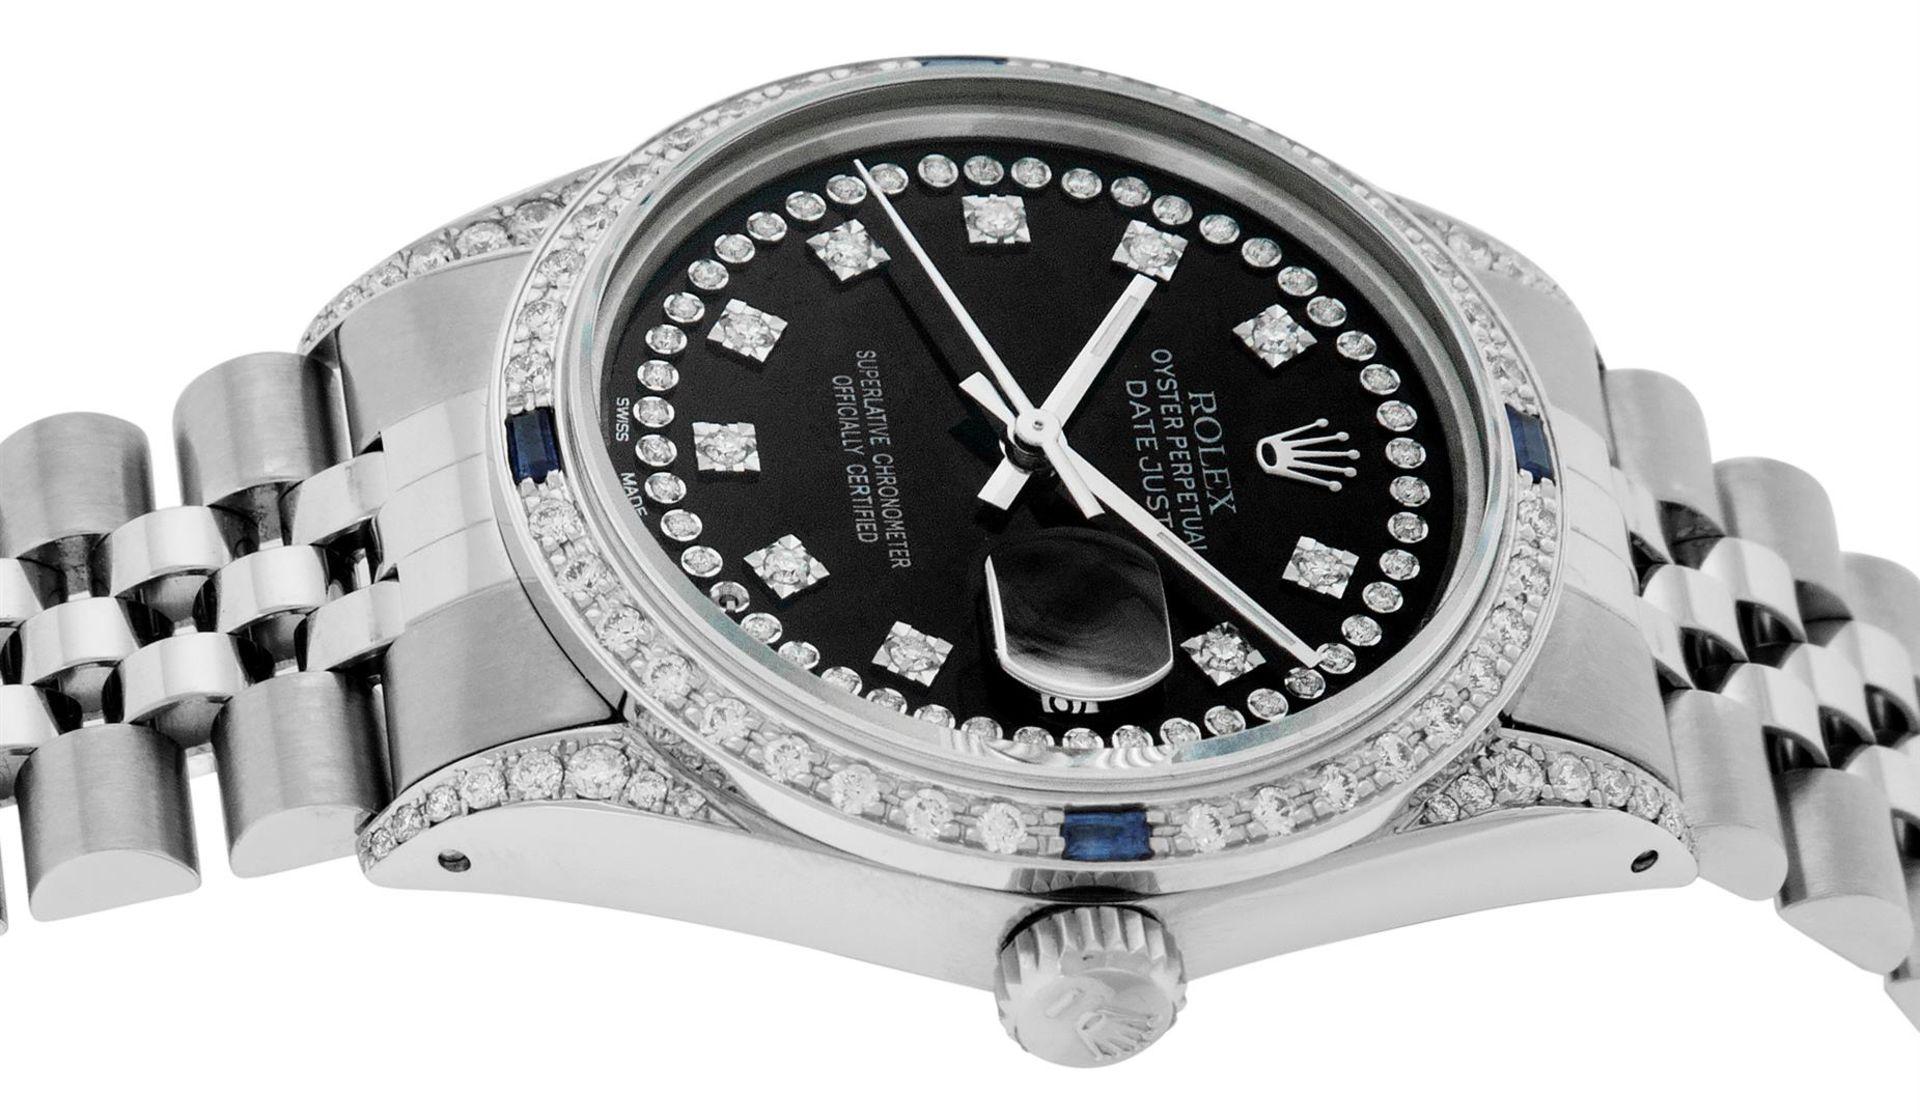 Rolex Mens Stainless Steel Black Diamond Lugs & Sapphire Datejust Wristwatch Oys - Image 9 of 9